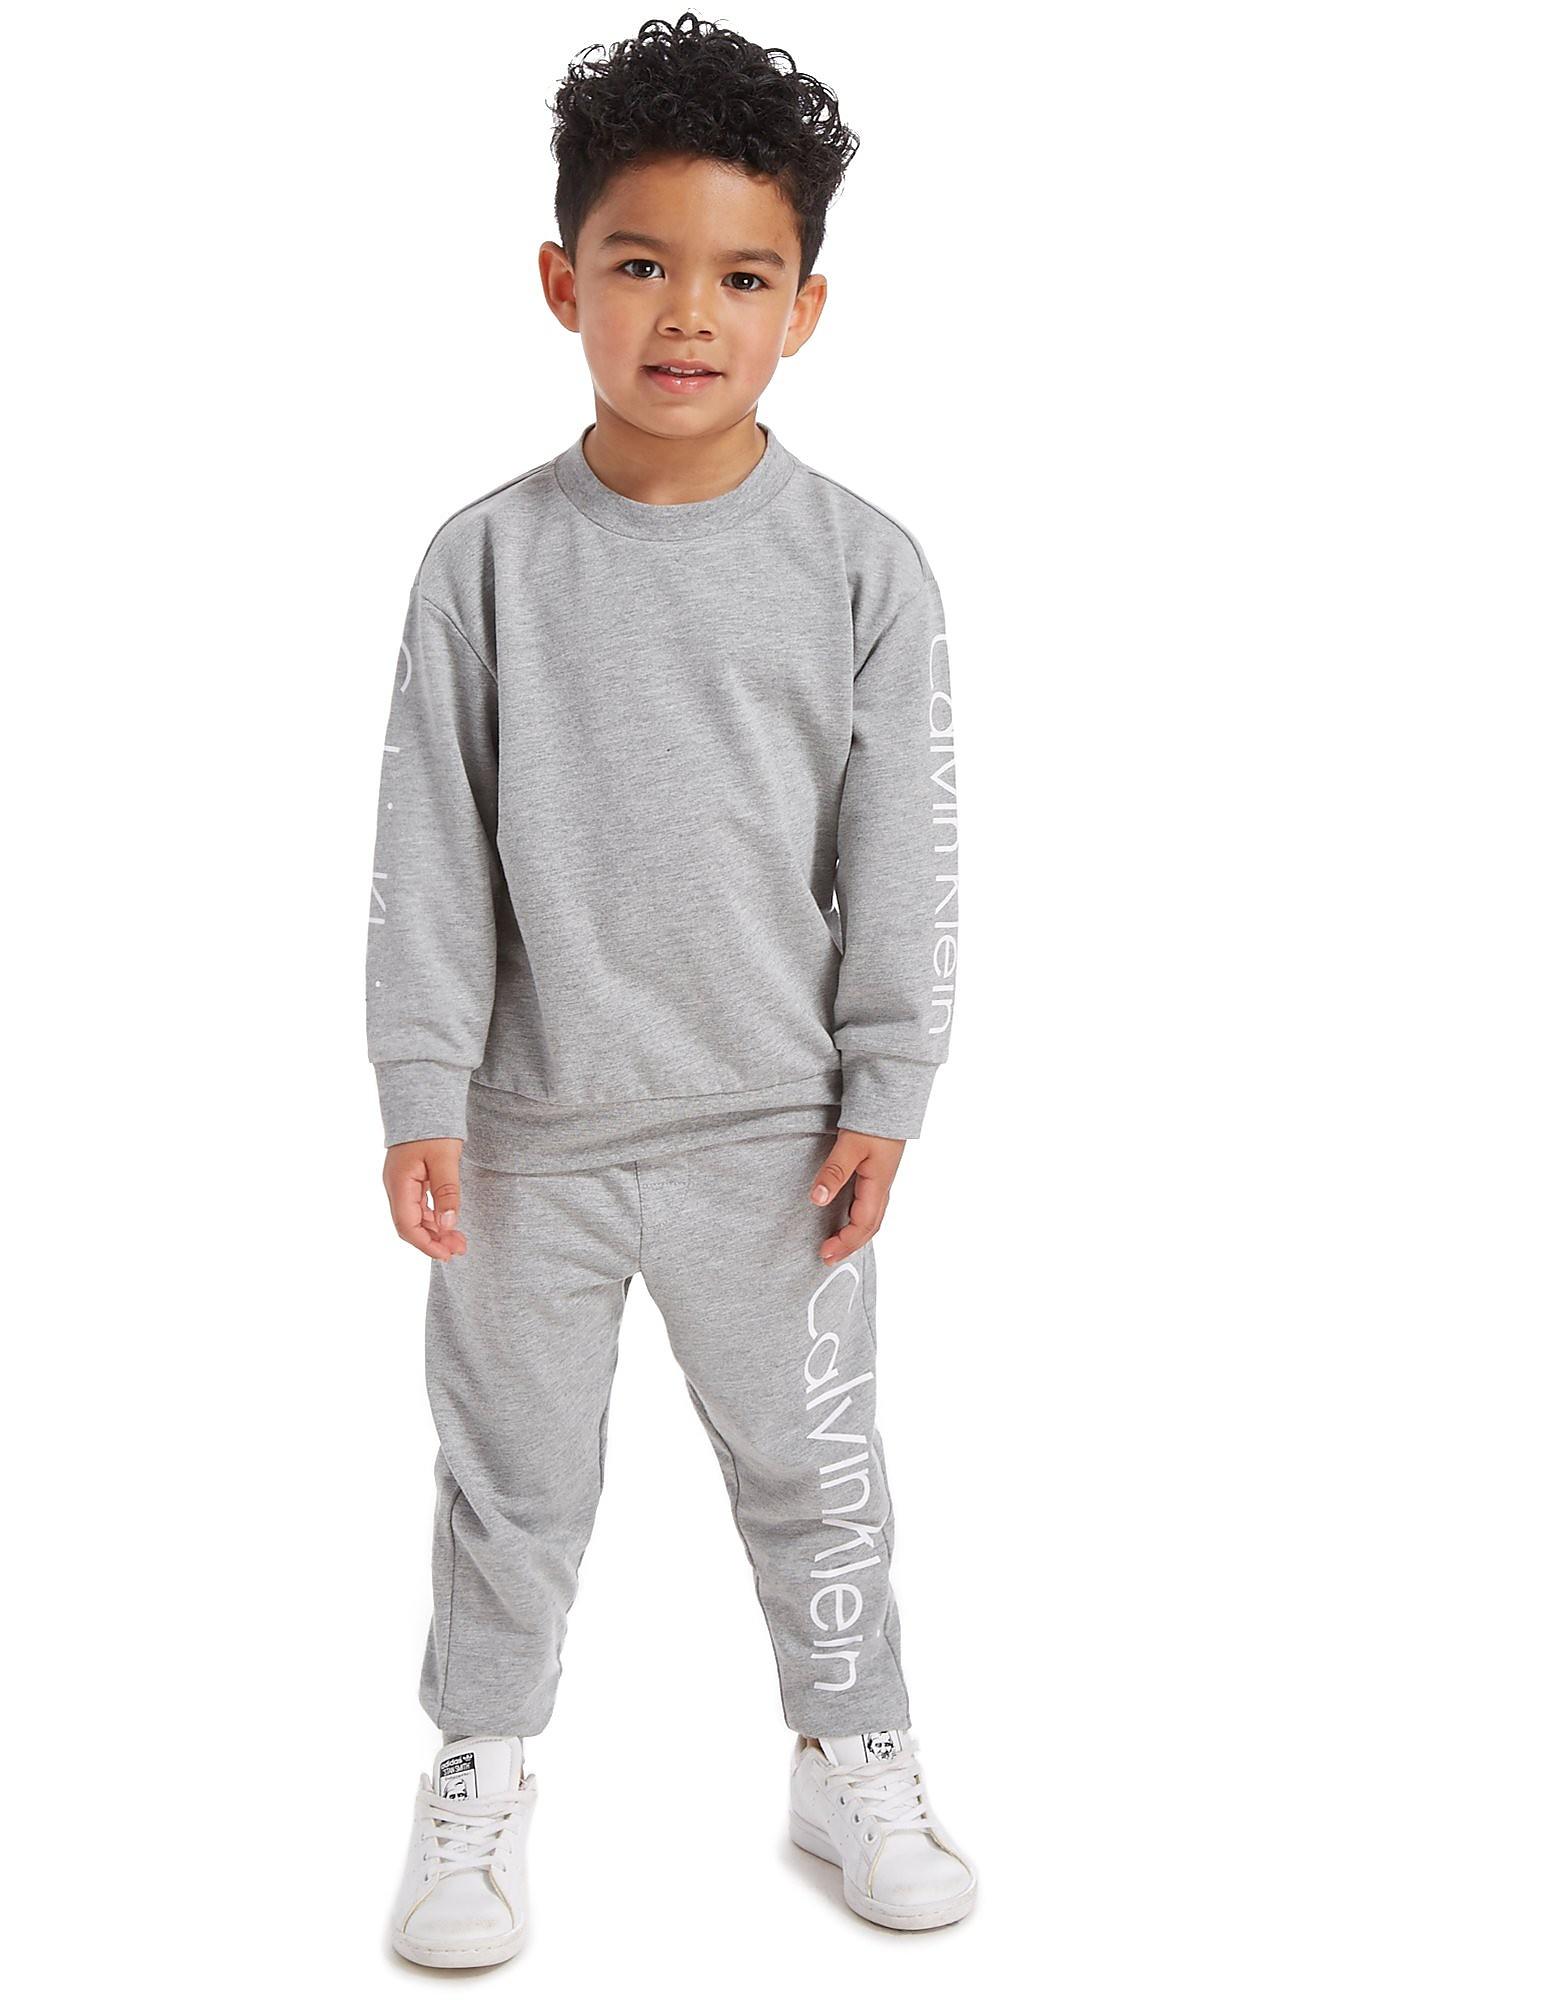 Calvin Klein Logo Pants Children